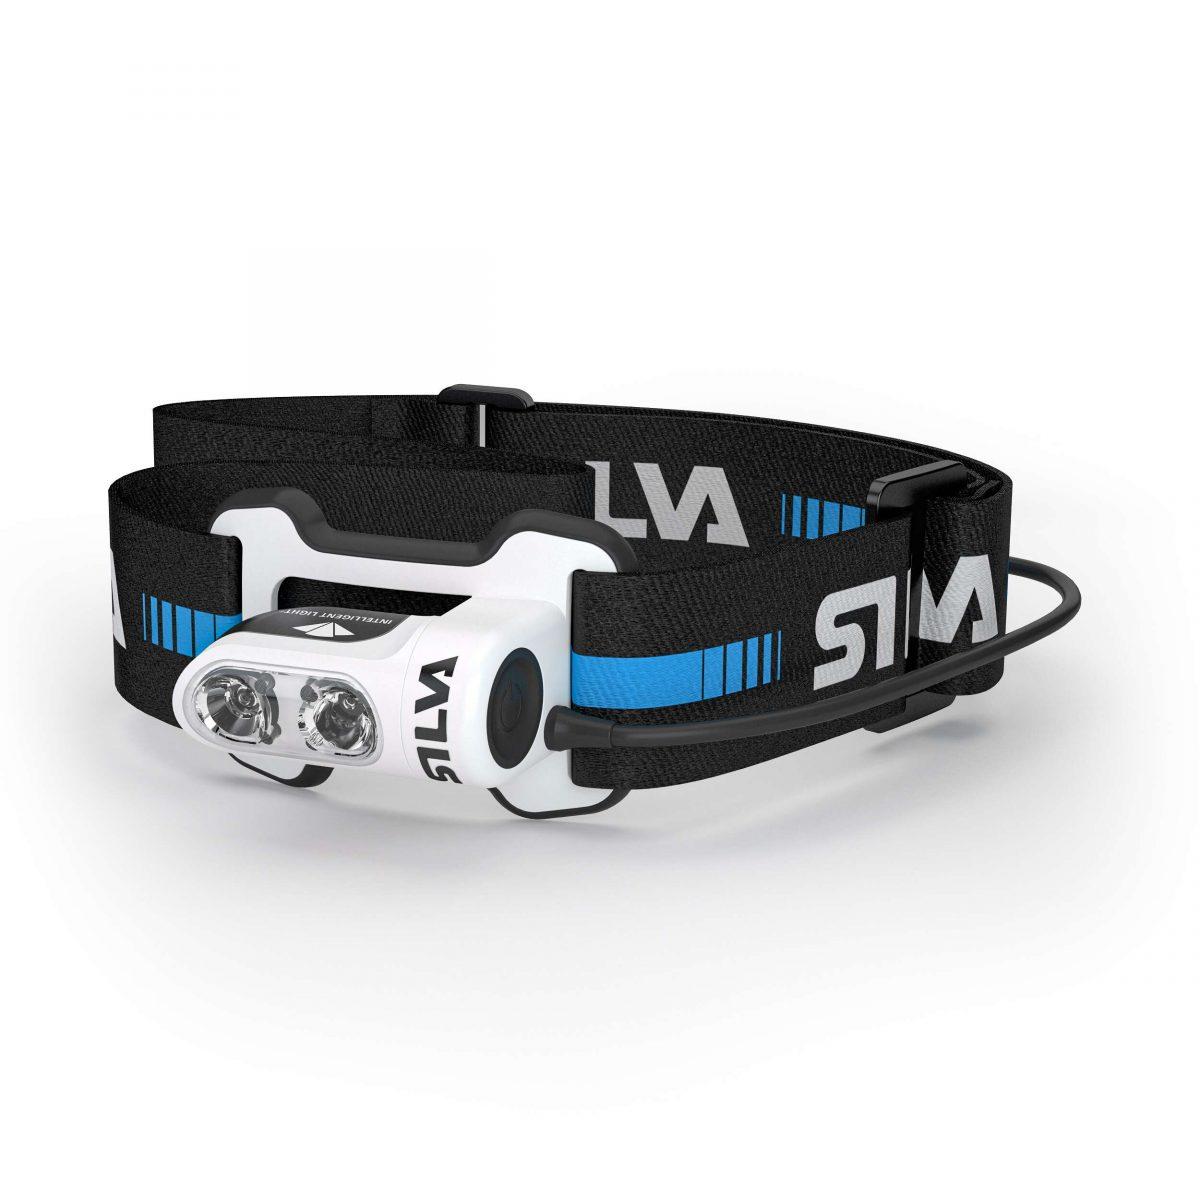 "Silva Stirnlampe ""Trail Runner 4X"" - Leichtathletik - Silva"